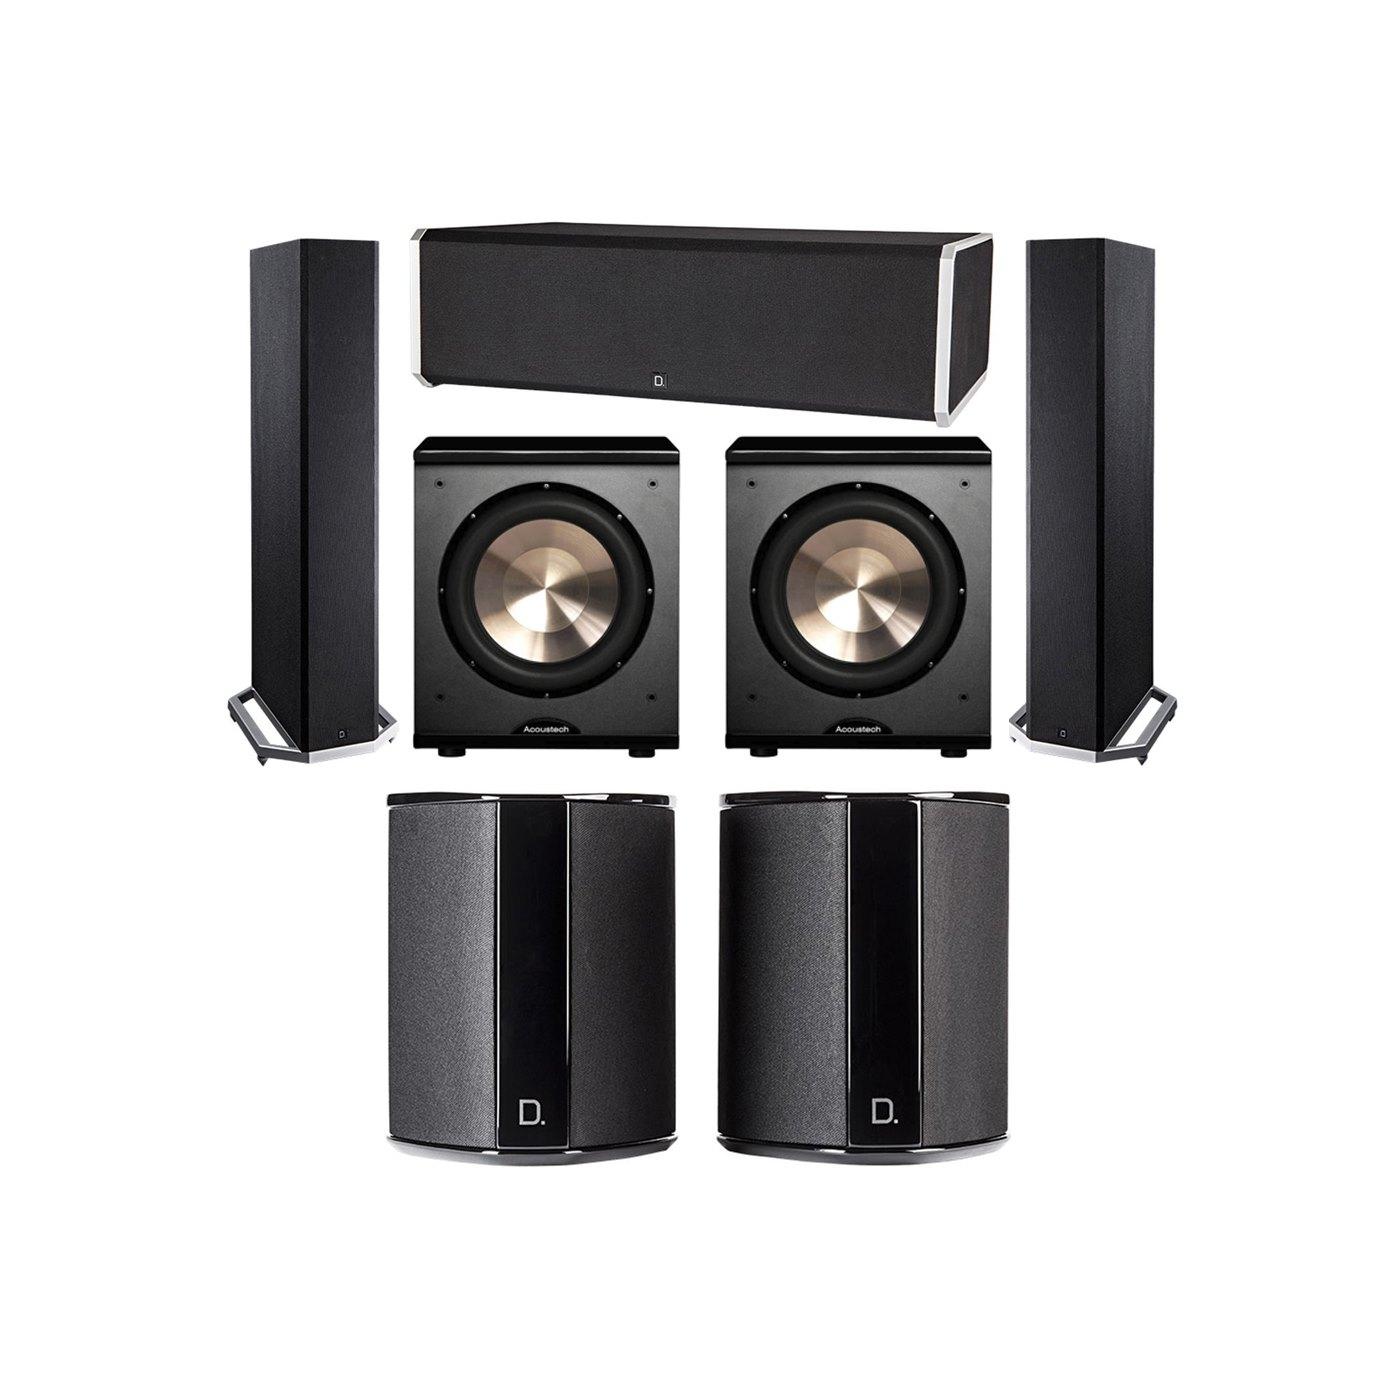 Definitive Technology 5.2 System with 2 BP9020 Tower Speakers, 1 CS9080 Center Channel Speaker, 2 SR9040 Surround Speaker, 2 BIC PL-200 Subwoofer